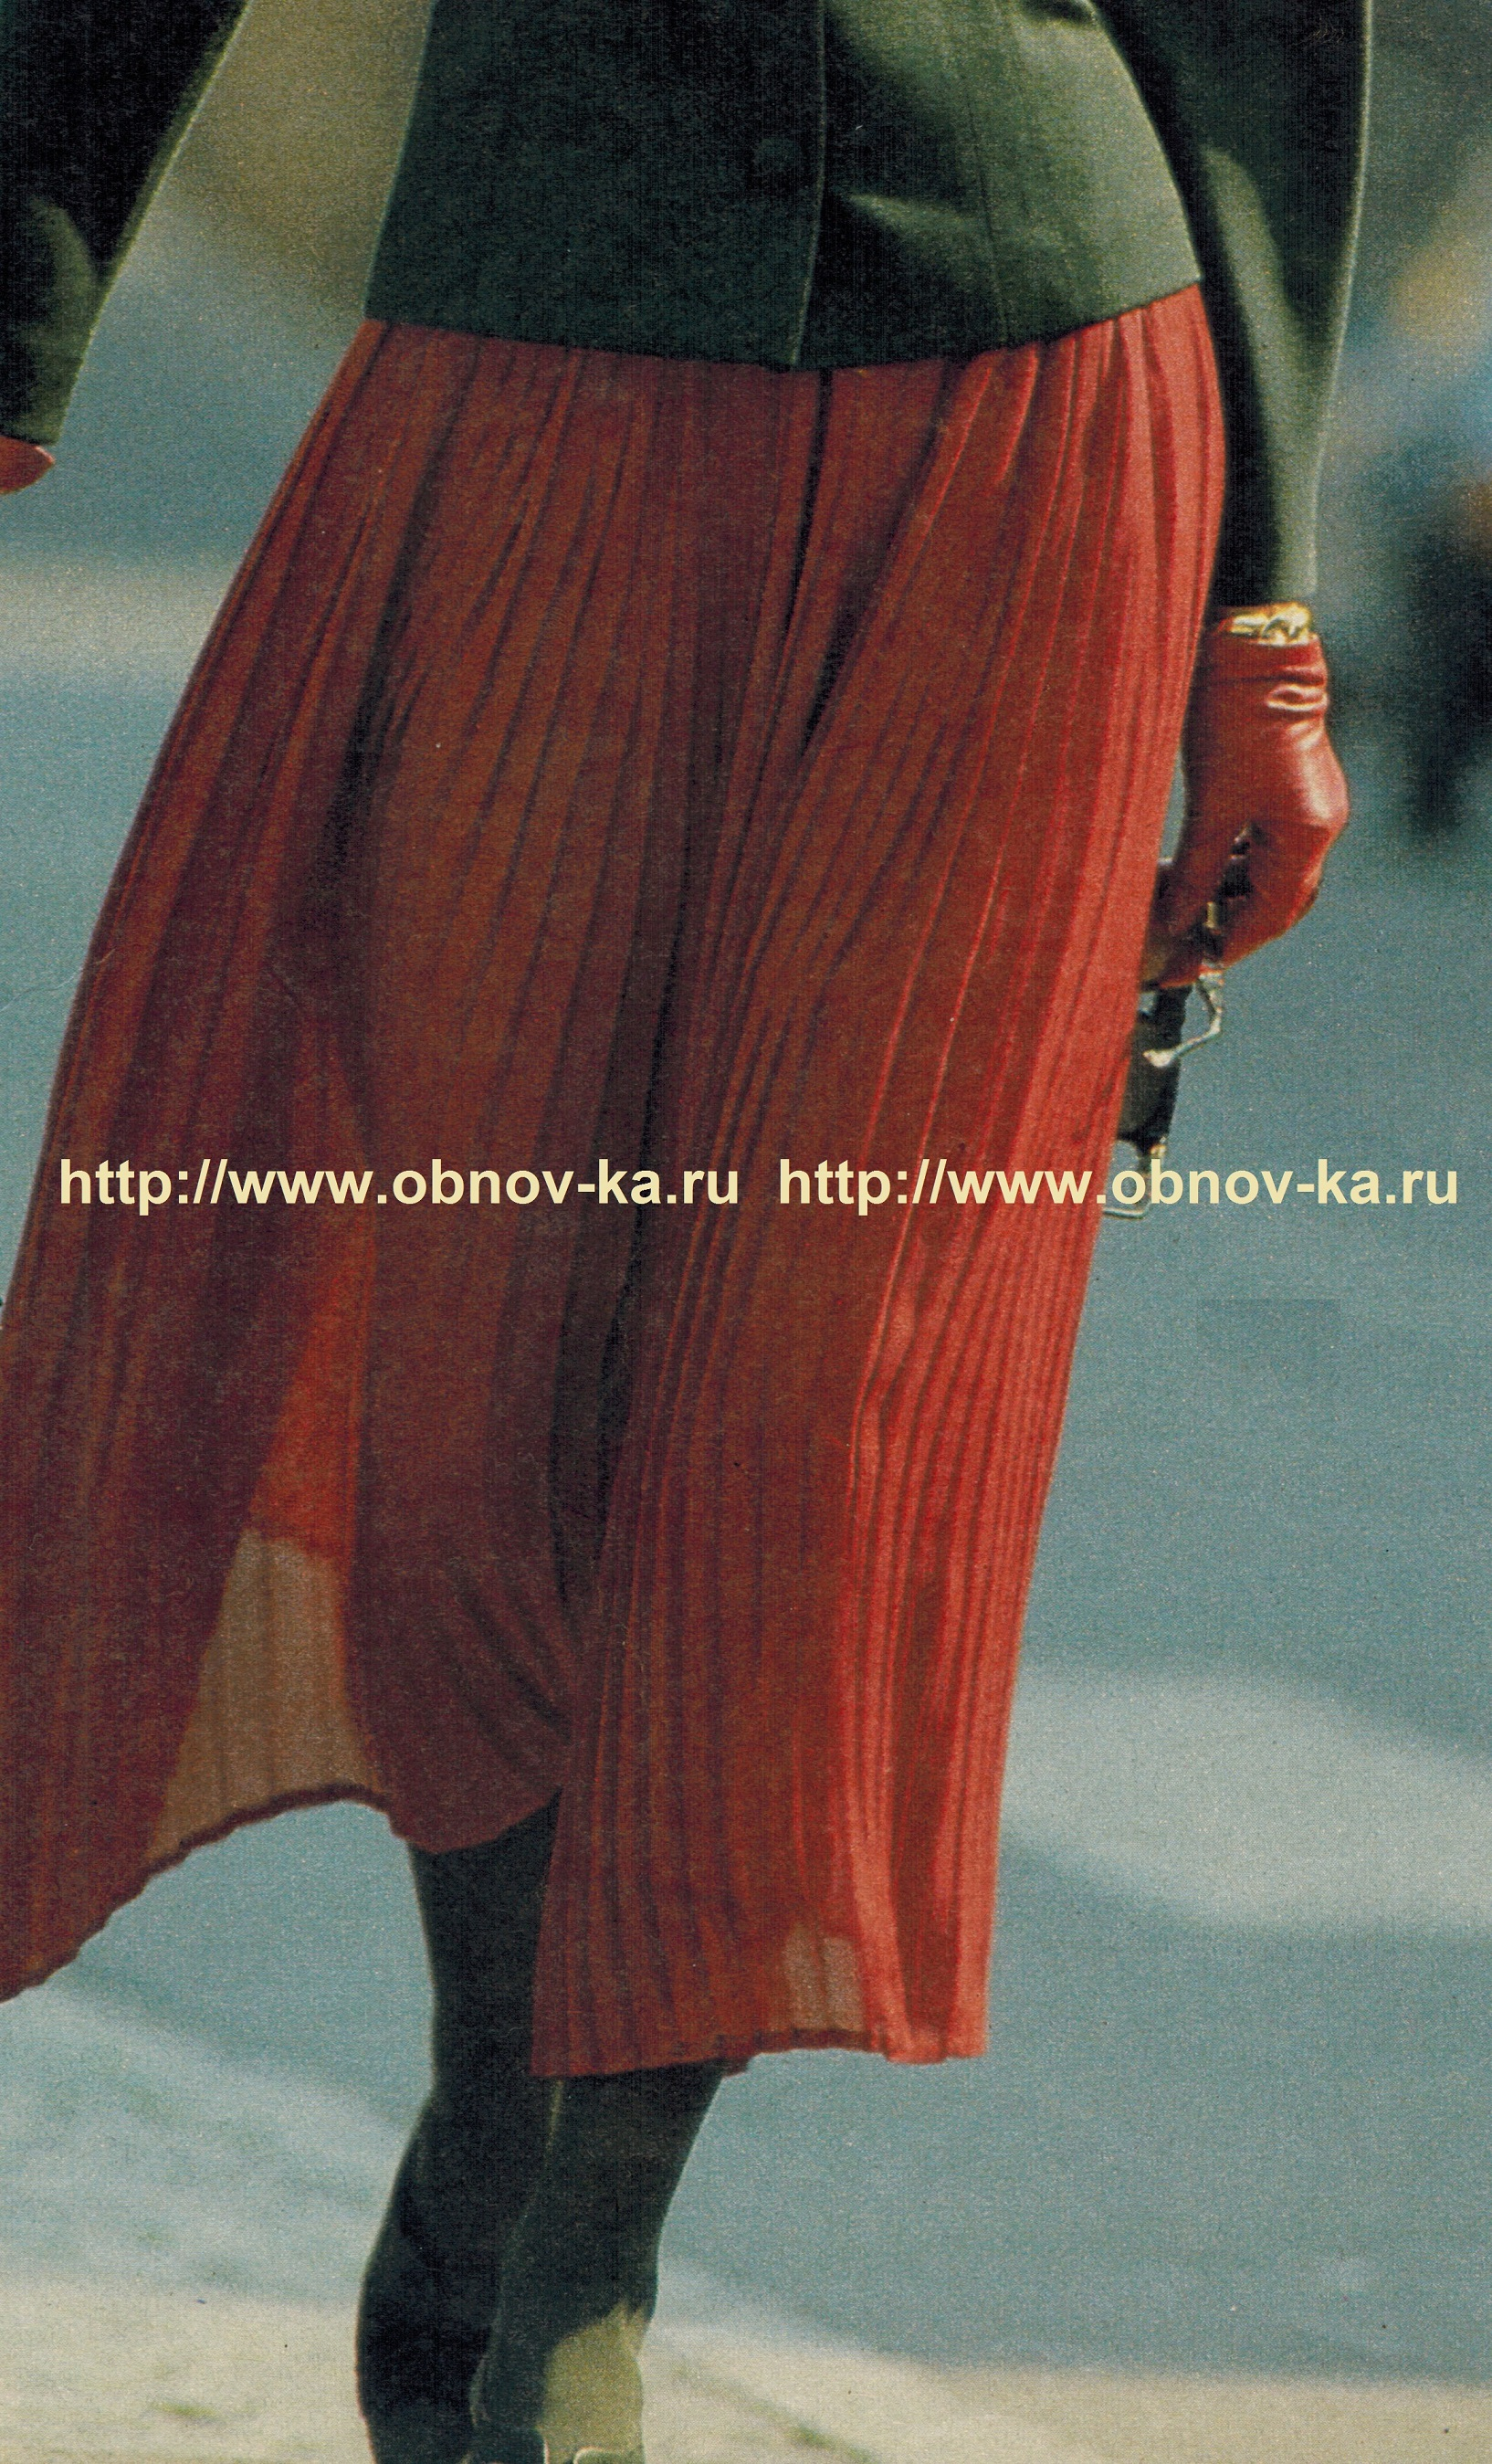 видео купить юбку плиссе: